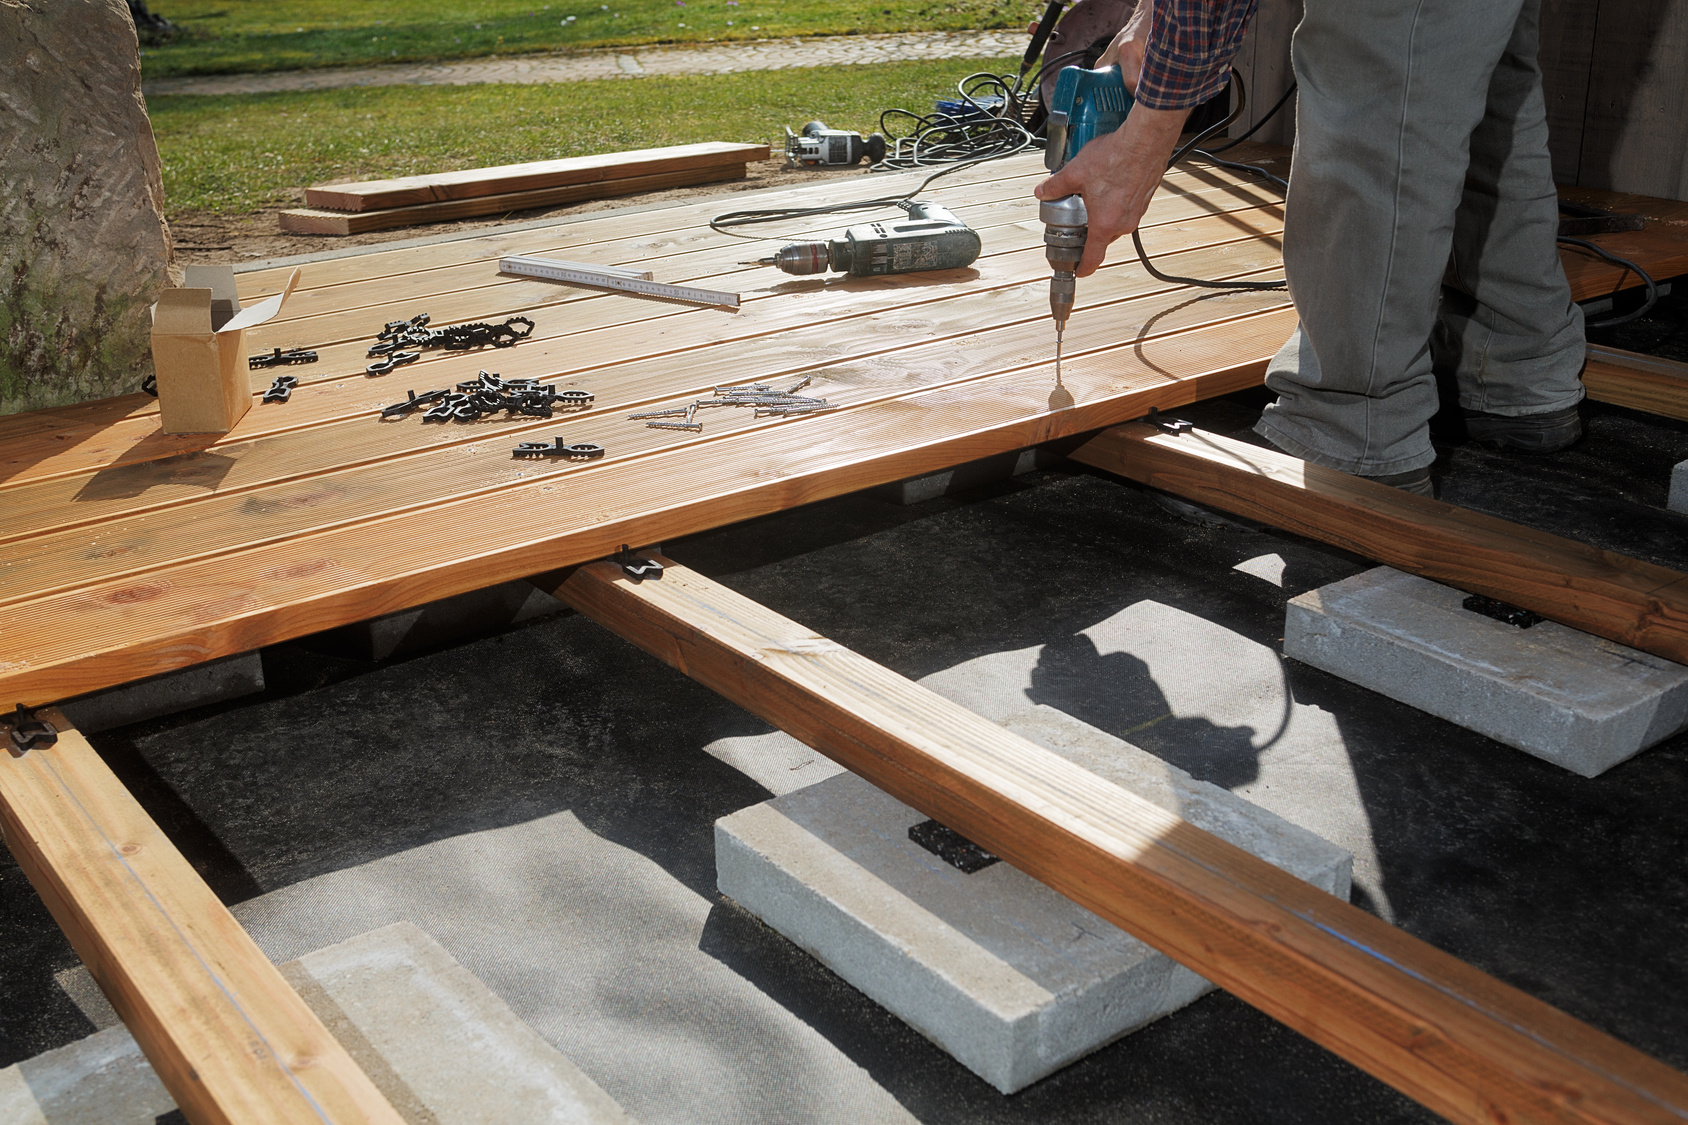 construire une terrasse en bois. Black Bedroom Furniture Sets. Home Design Ideas